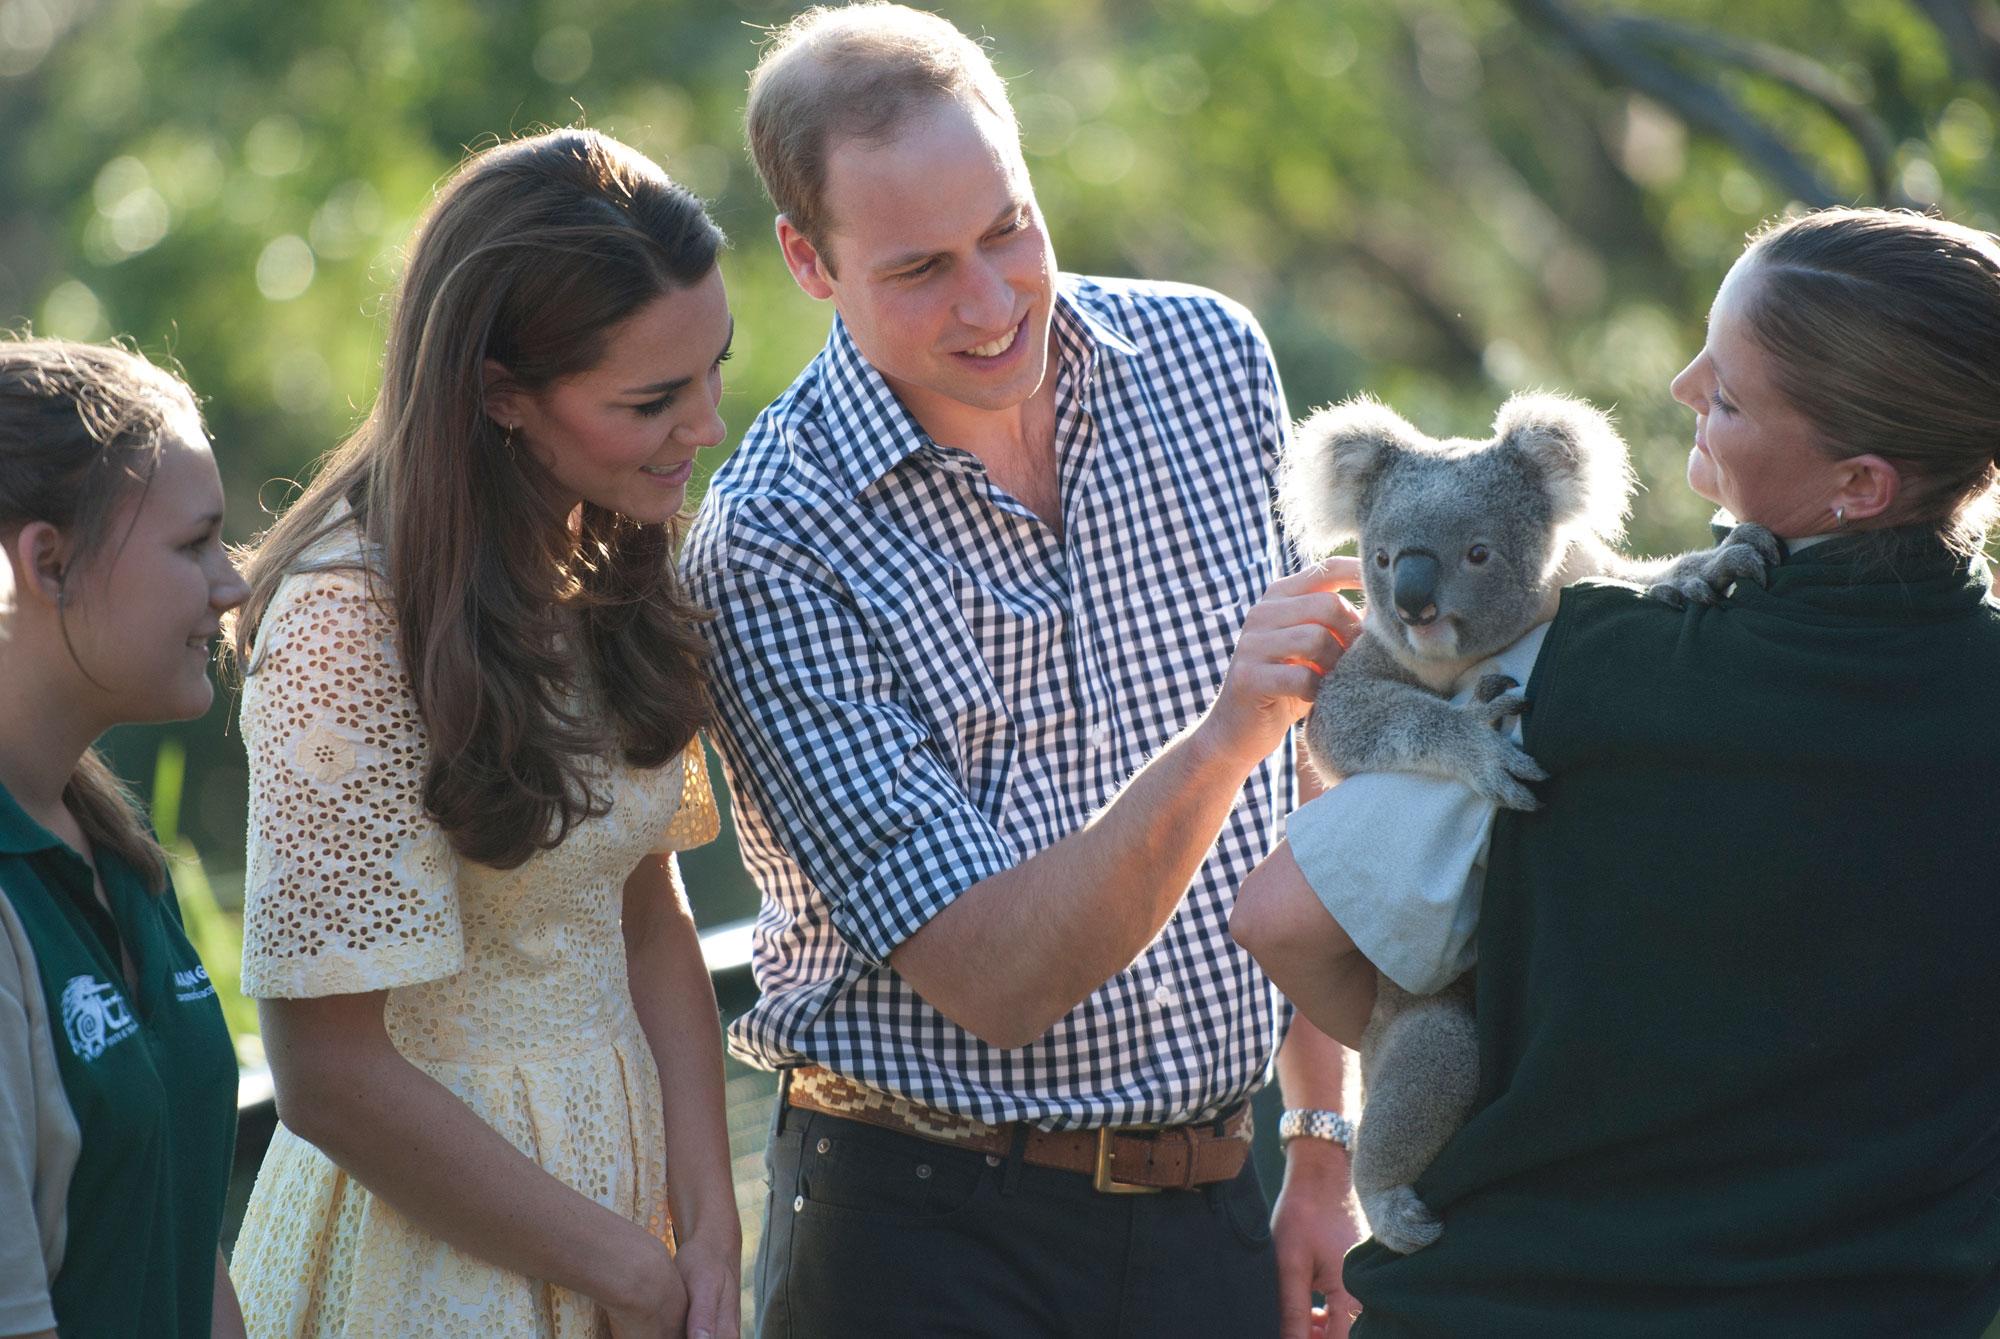 William and Kate pat a koala named Leuca held by Lucinda Cveticanin